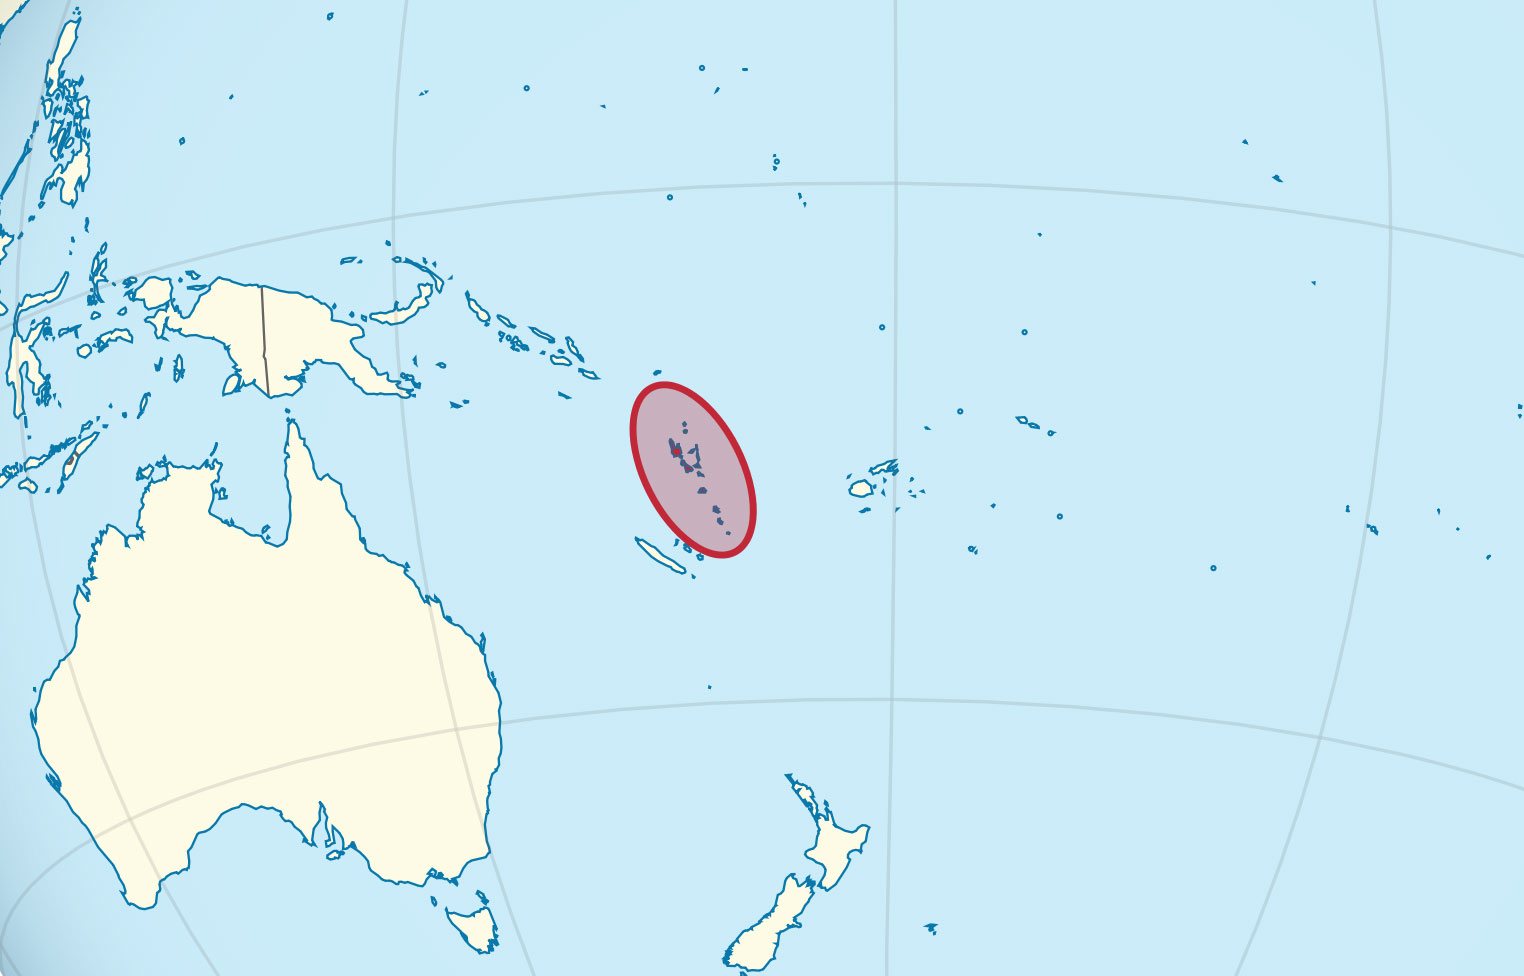 Localización geográfica de Vanuatu